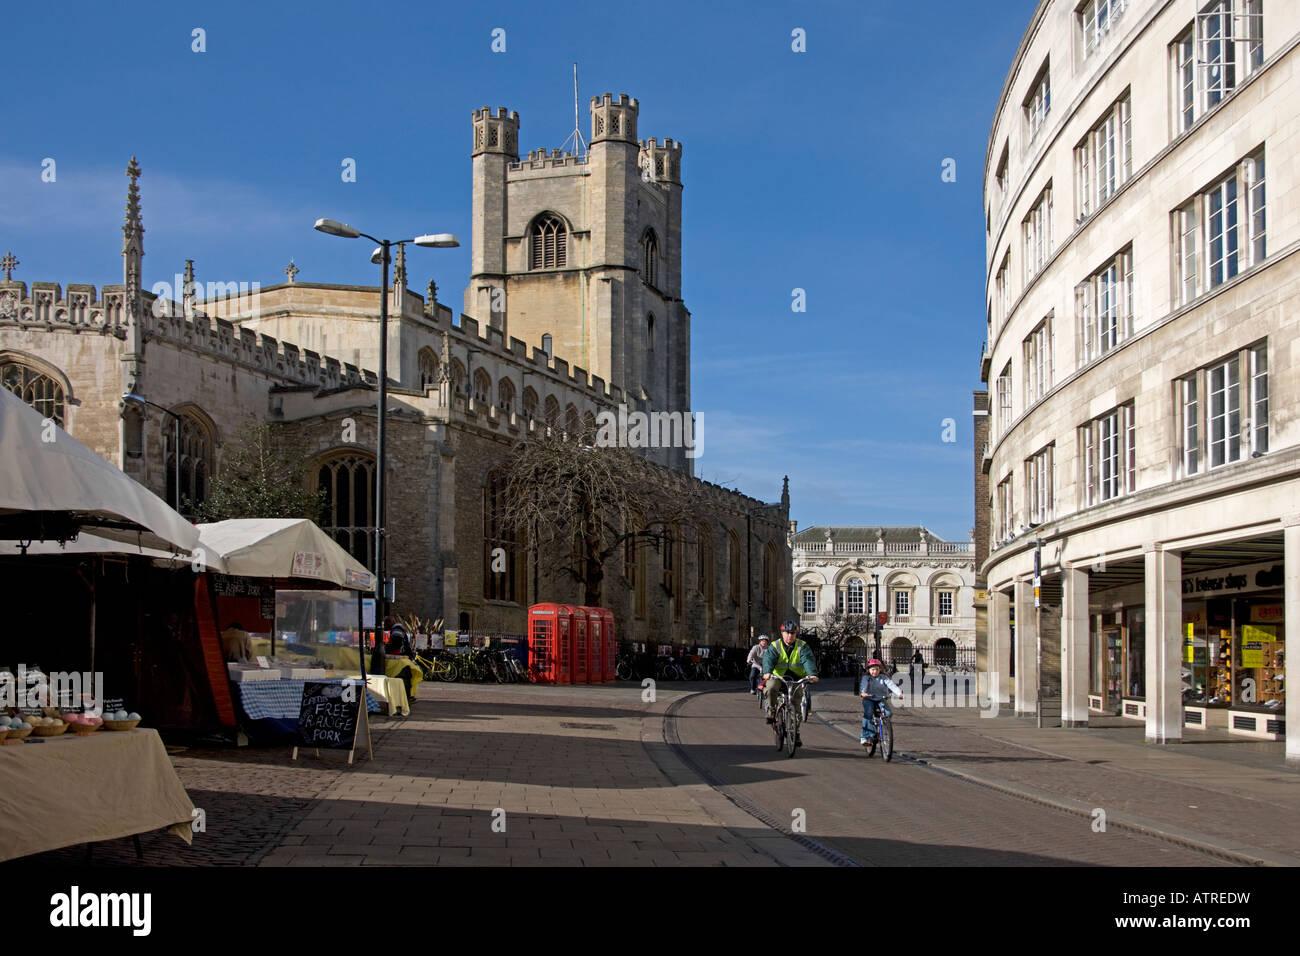 Great St Mary's church. Cambridge. Cambridgeshire. East Anglia. UK. - Stock Image